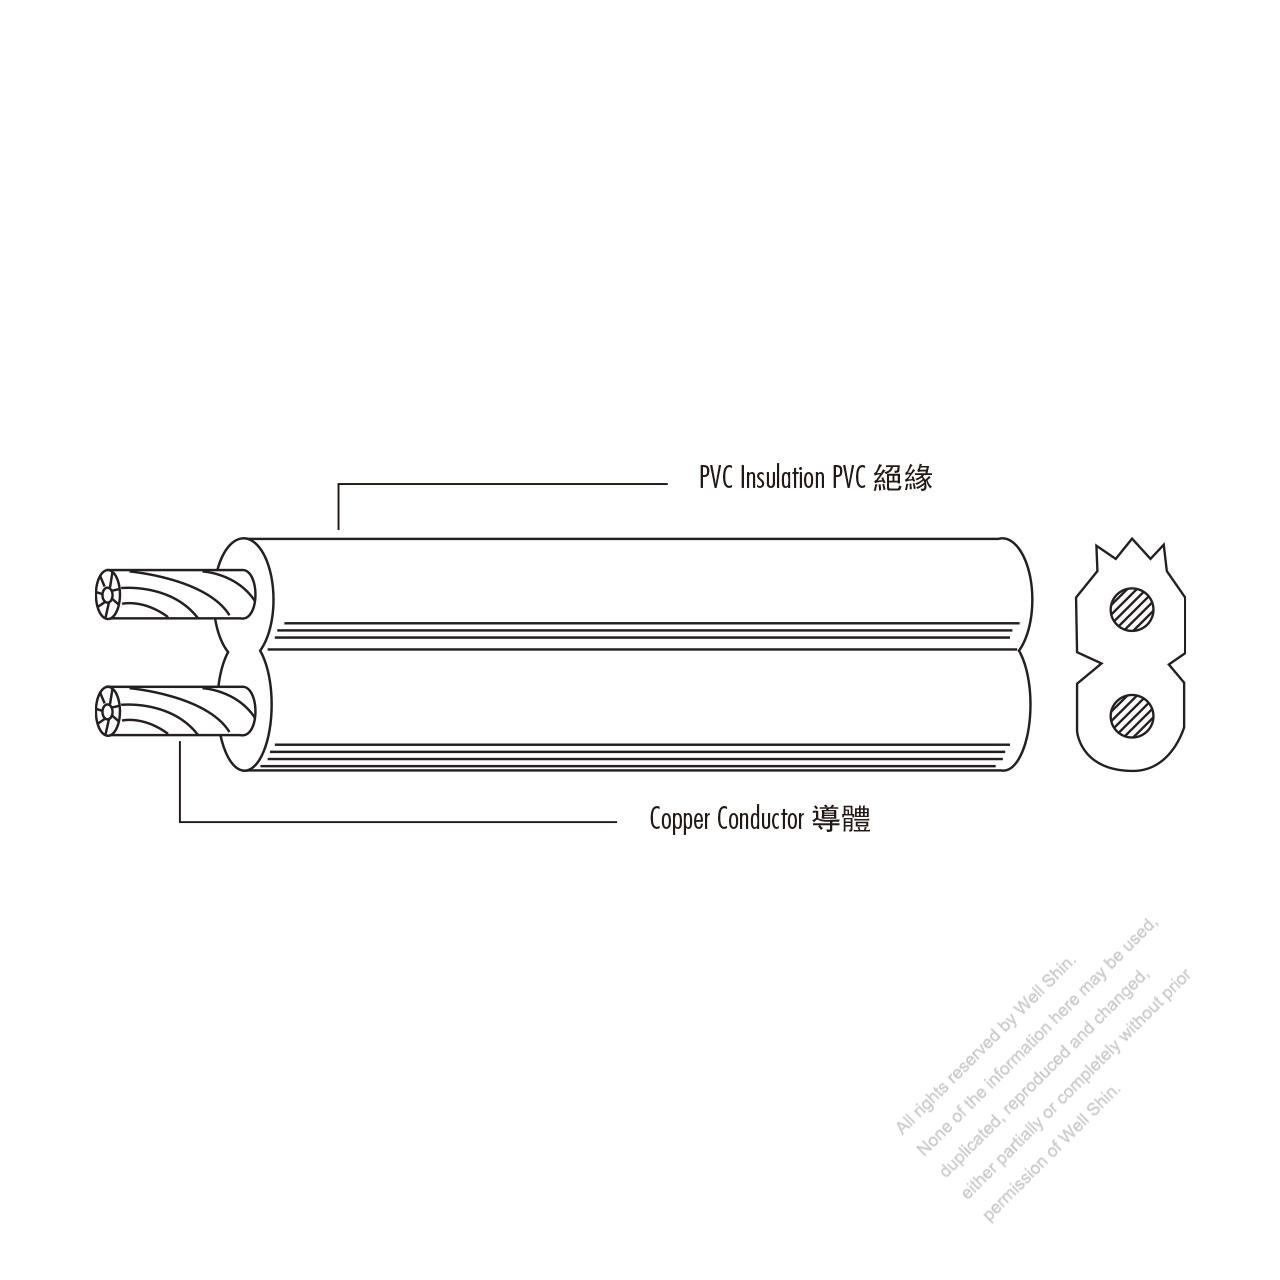 USA/Canada Type AC Power PVC Wire SPT-1, SPT-2 , SPT-3 - Well Shin ...